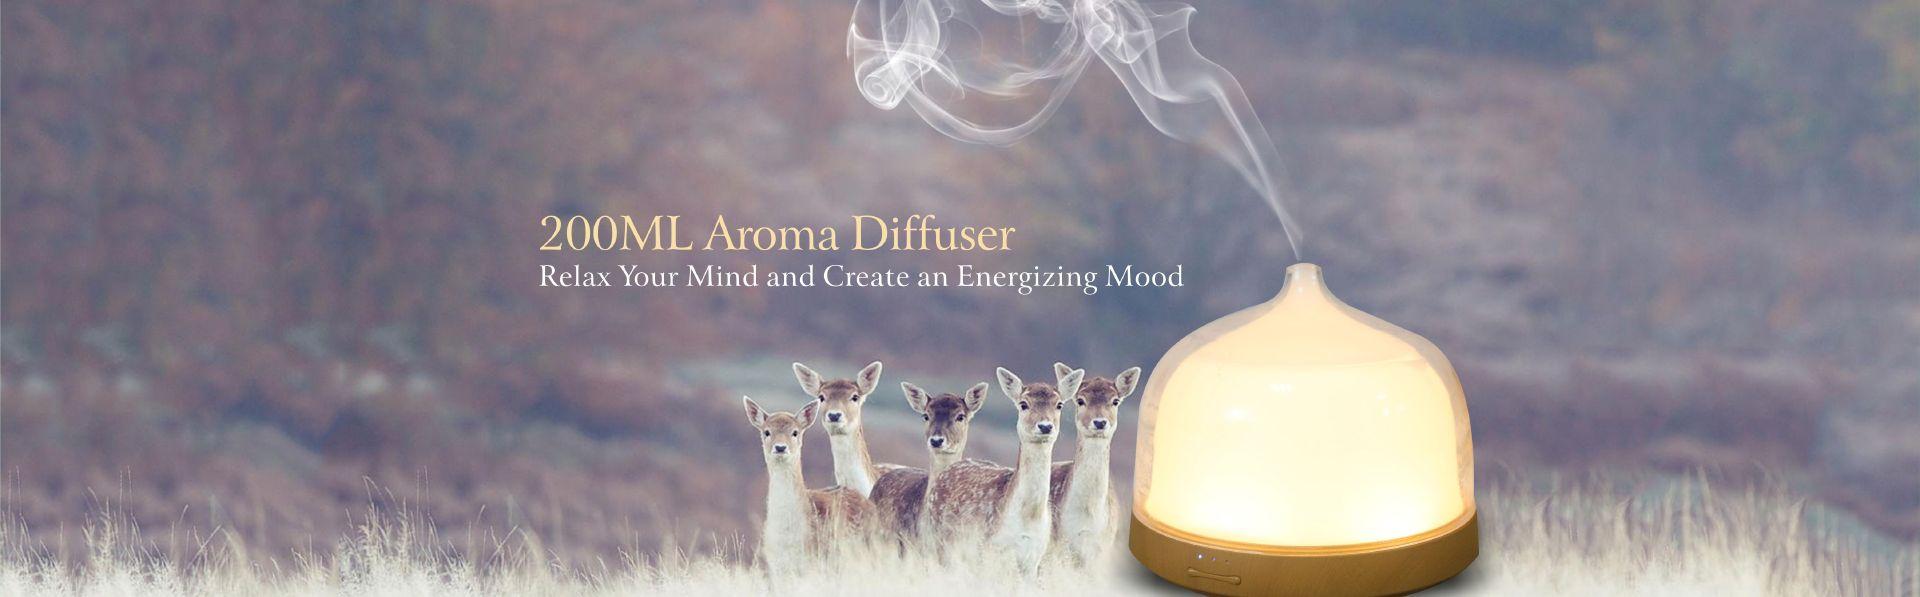 400mL Wood Grian Aroma Diffuser Mini Humidifier